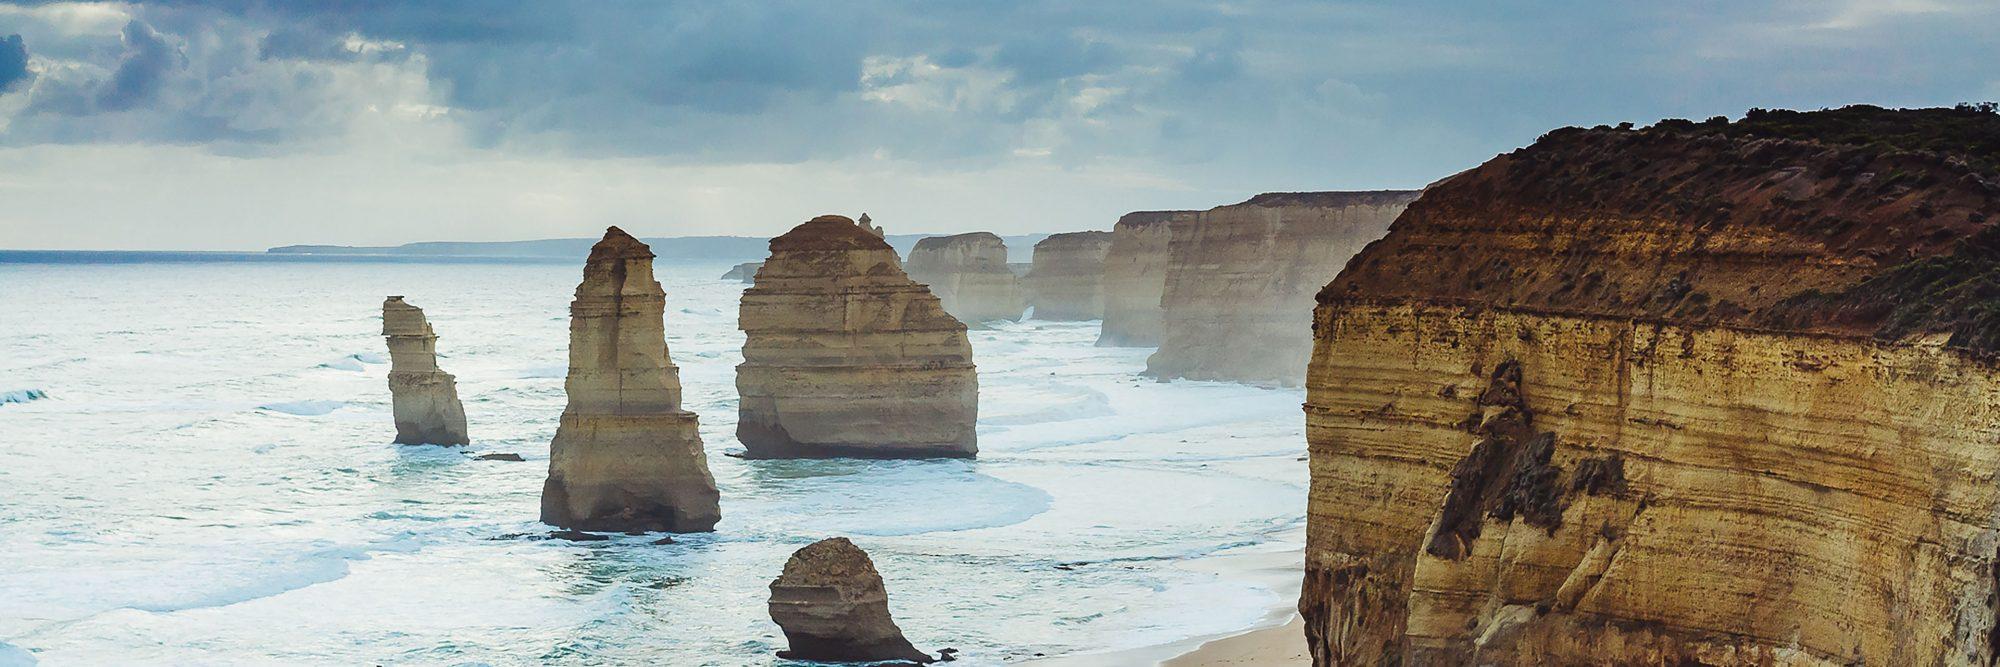 Melbourne Australia Jelly Journeys